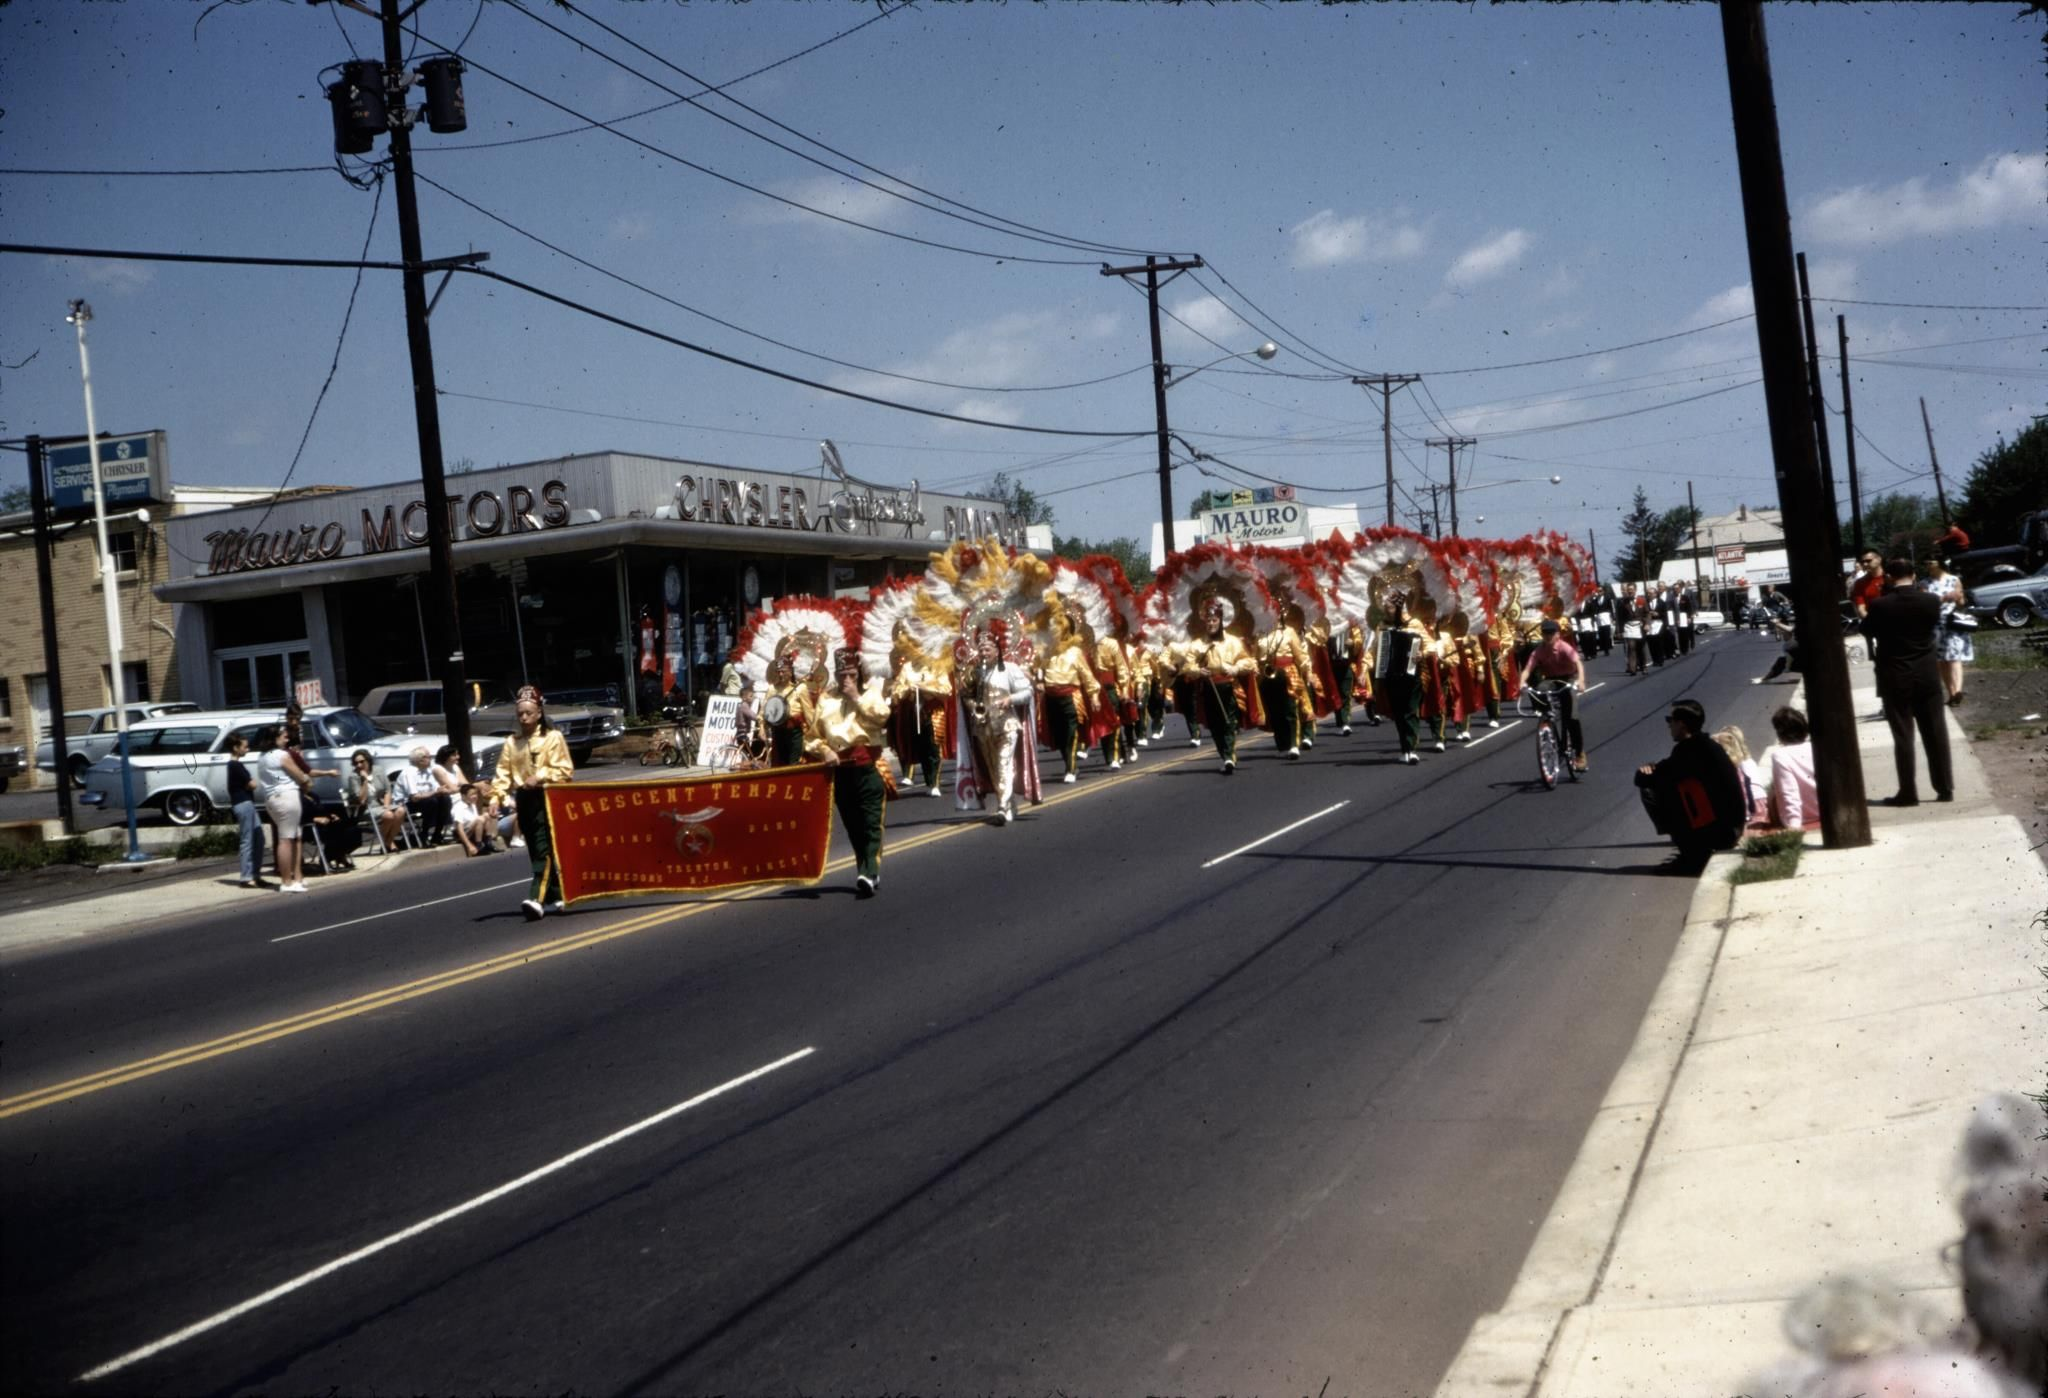 Mauro Motors Parade On Amboy Ave Historical Photos Street View Photo